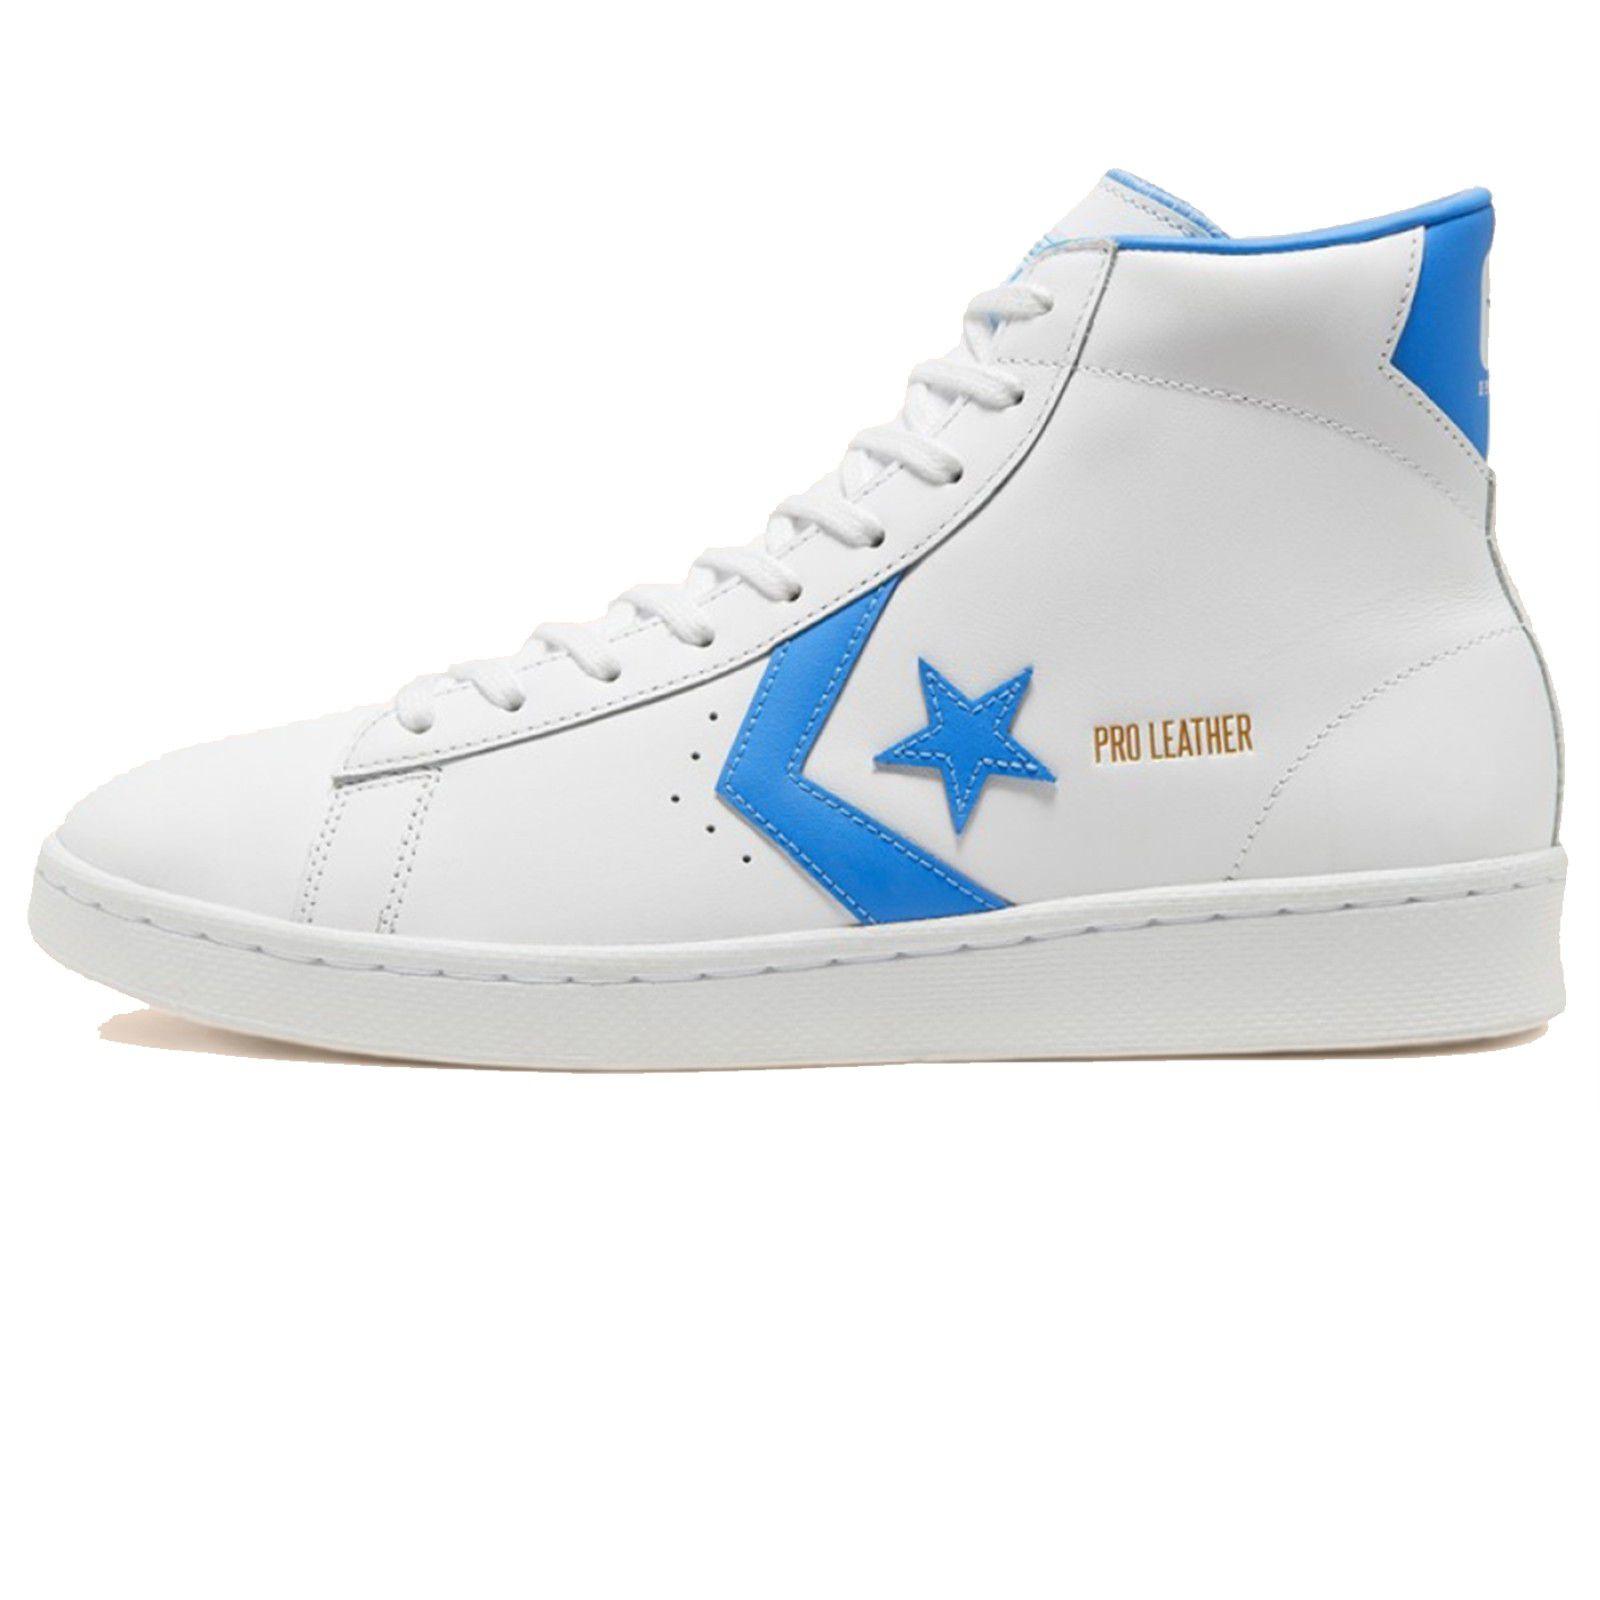 pro leather converse